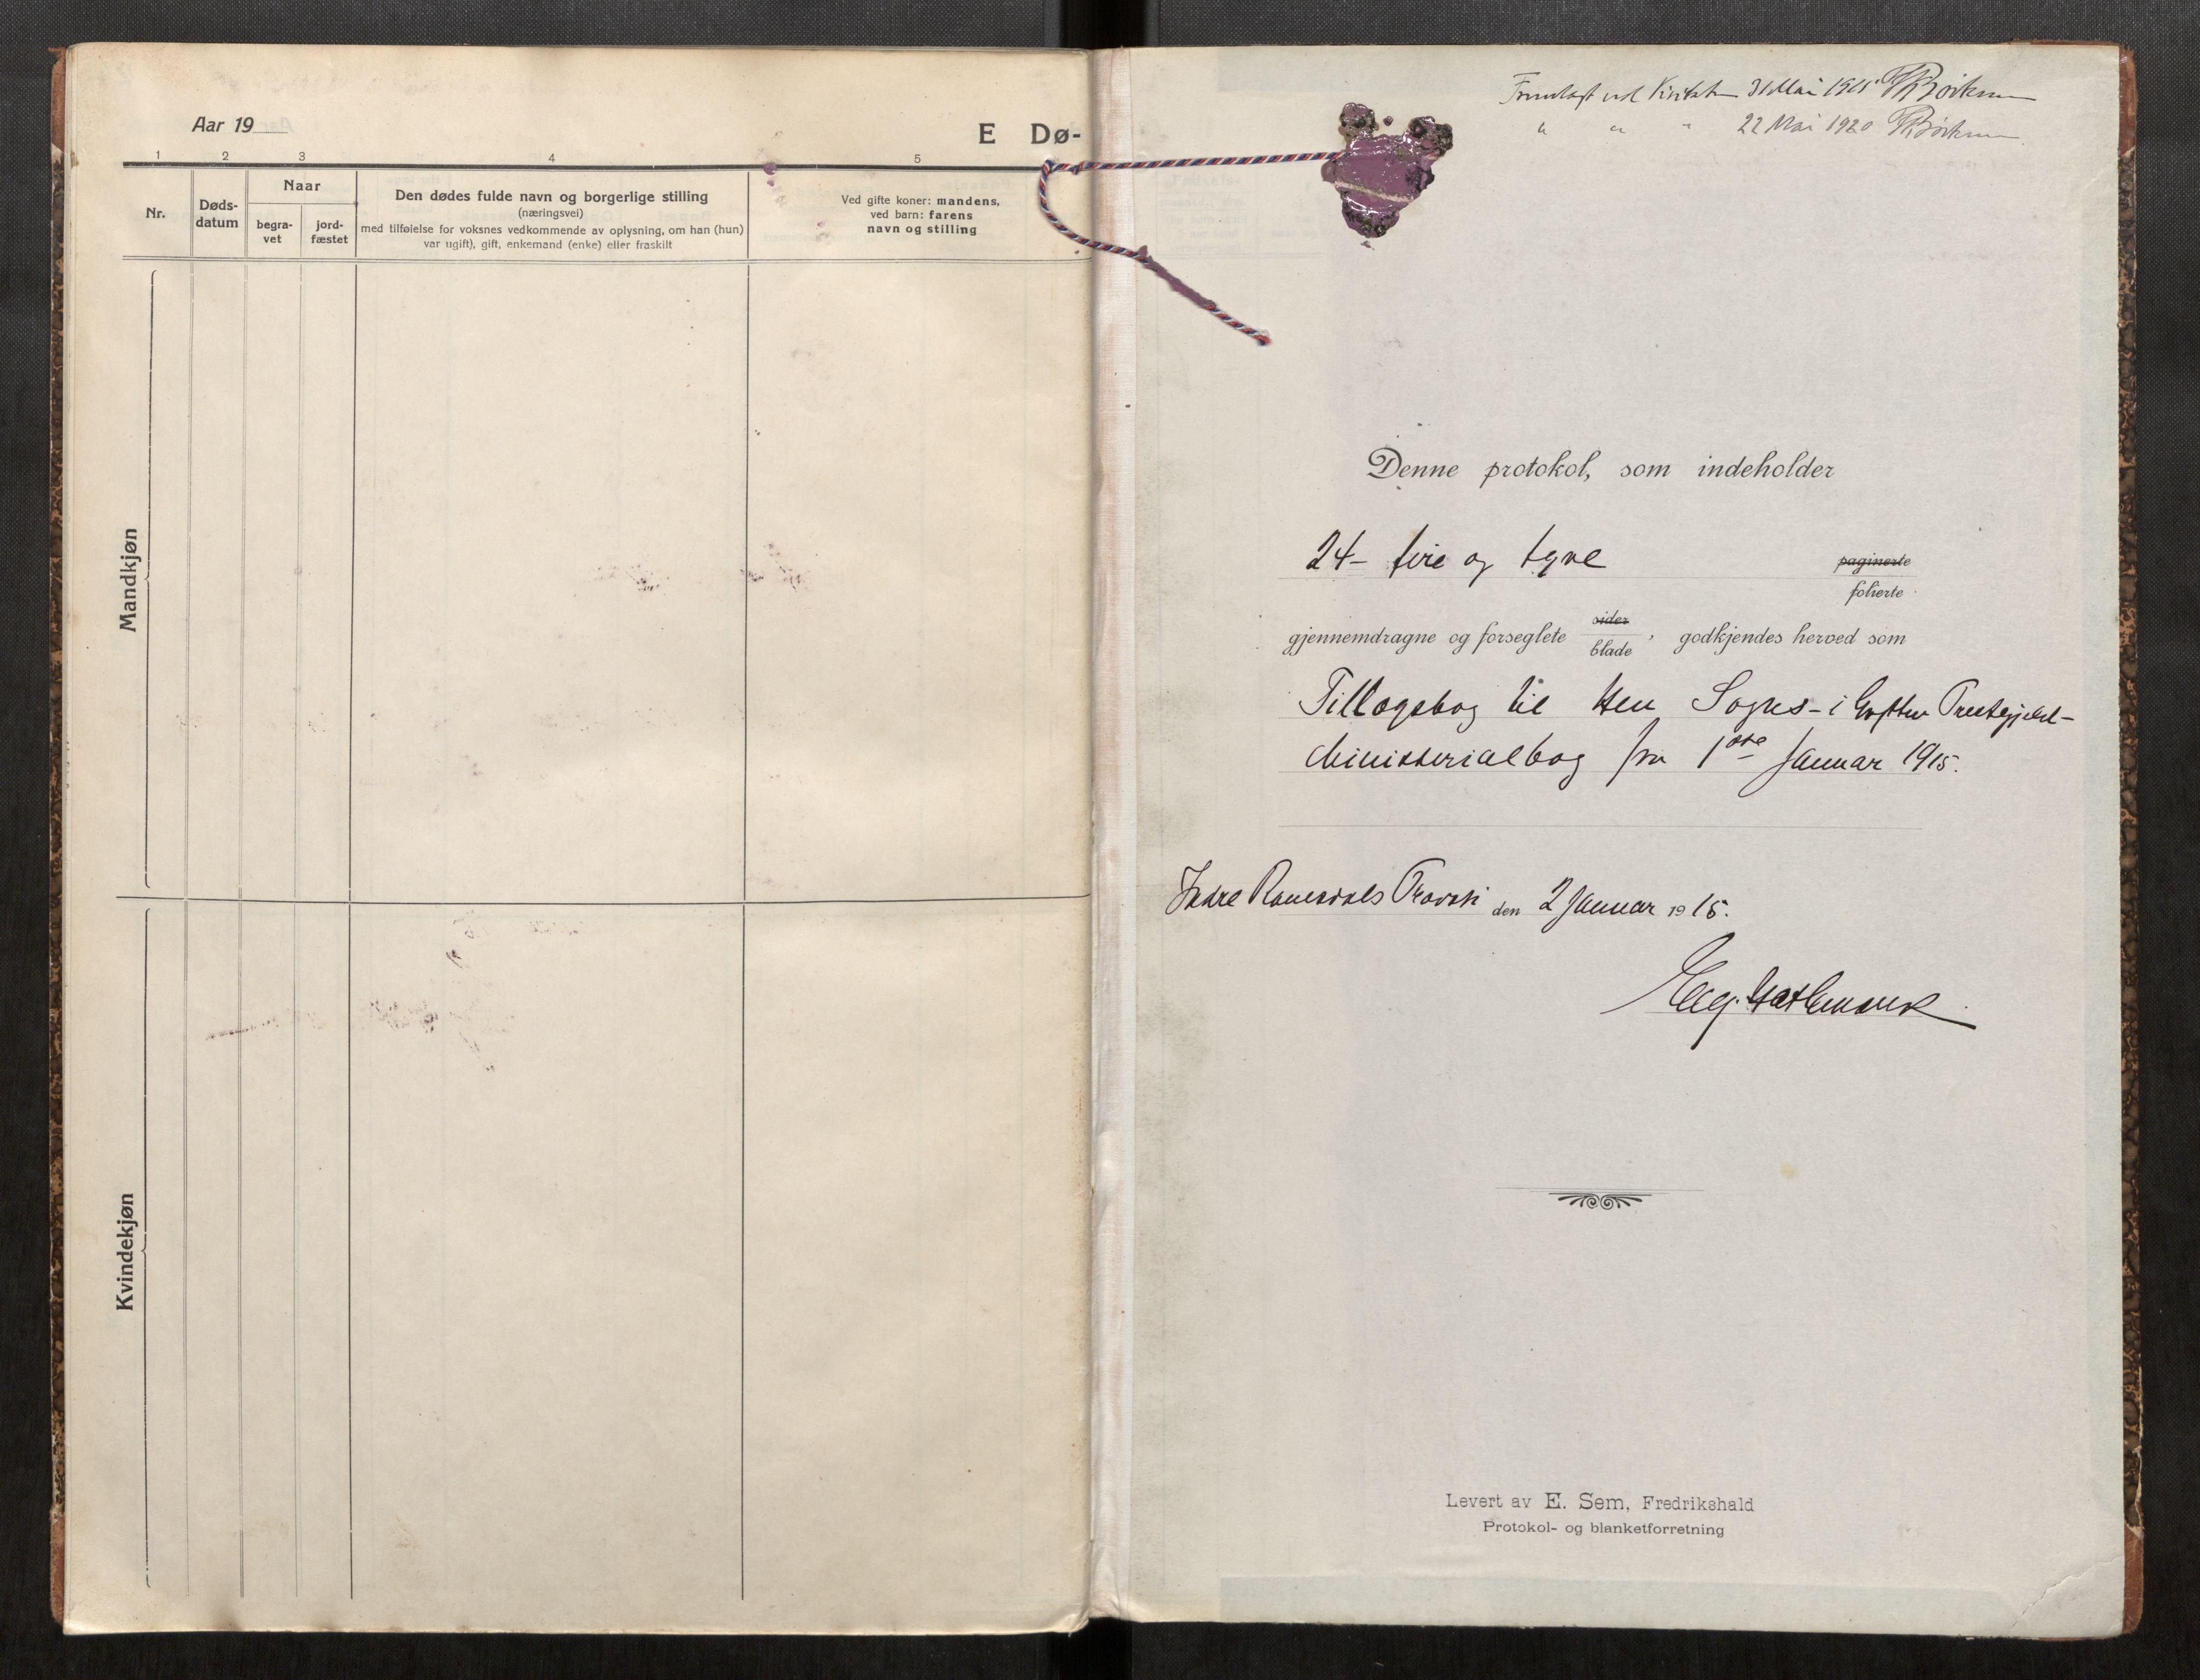 SAT, Grytten sokneprestkontor, Ministerialbok nr. 545A05, 1915-1921